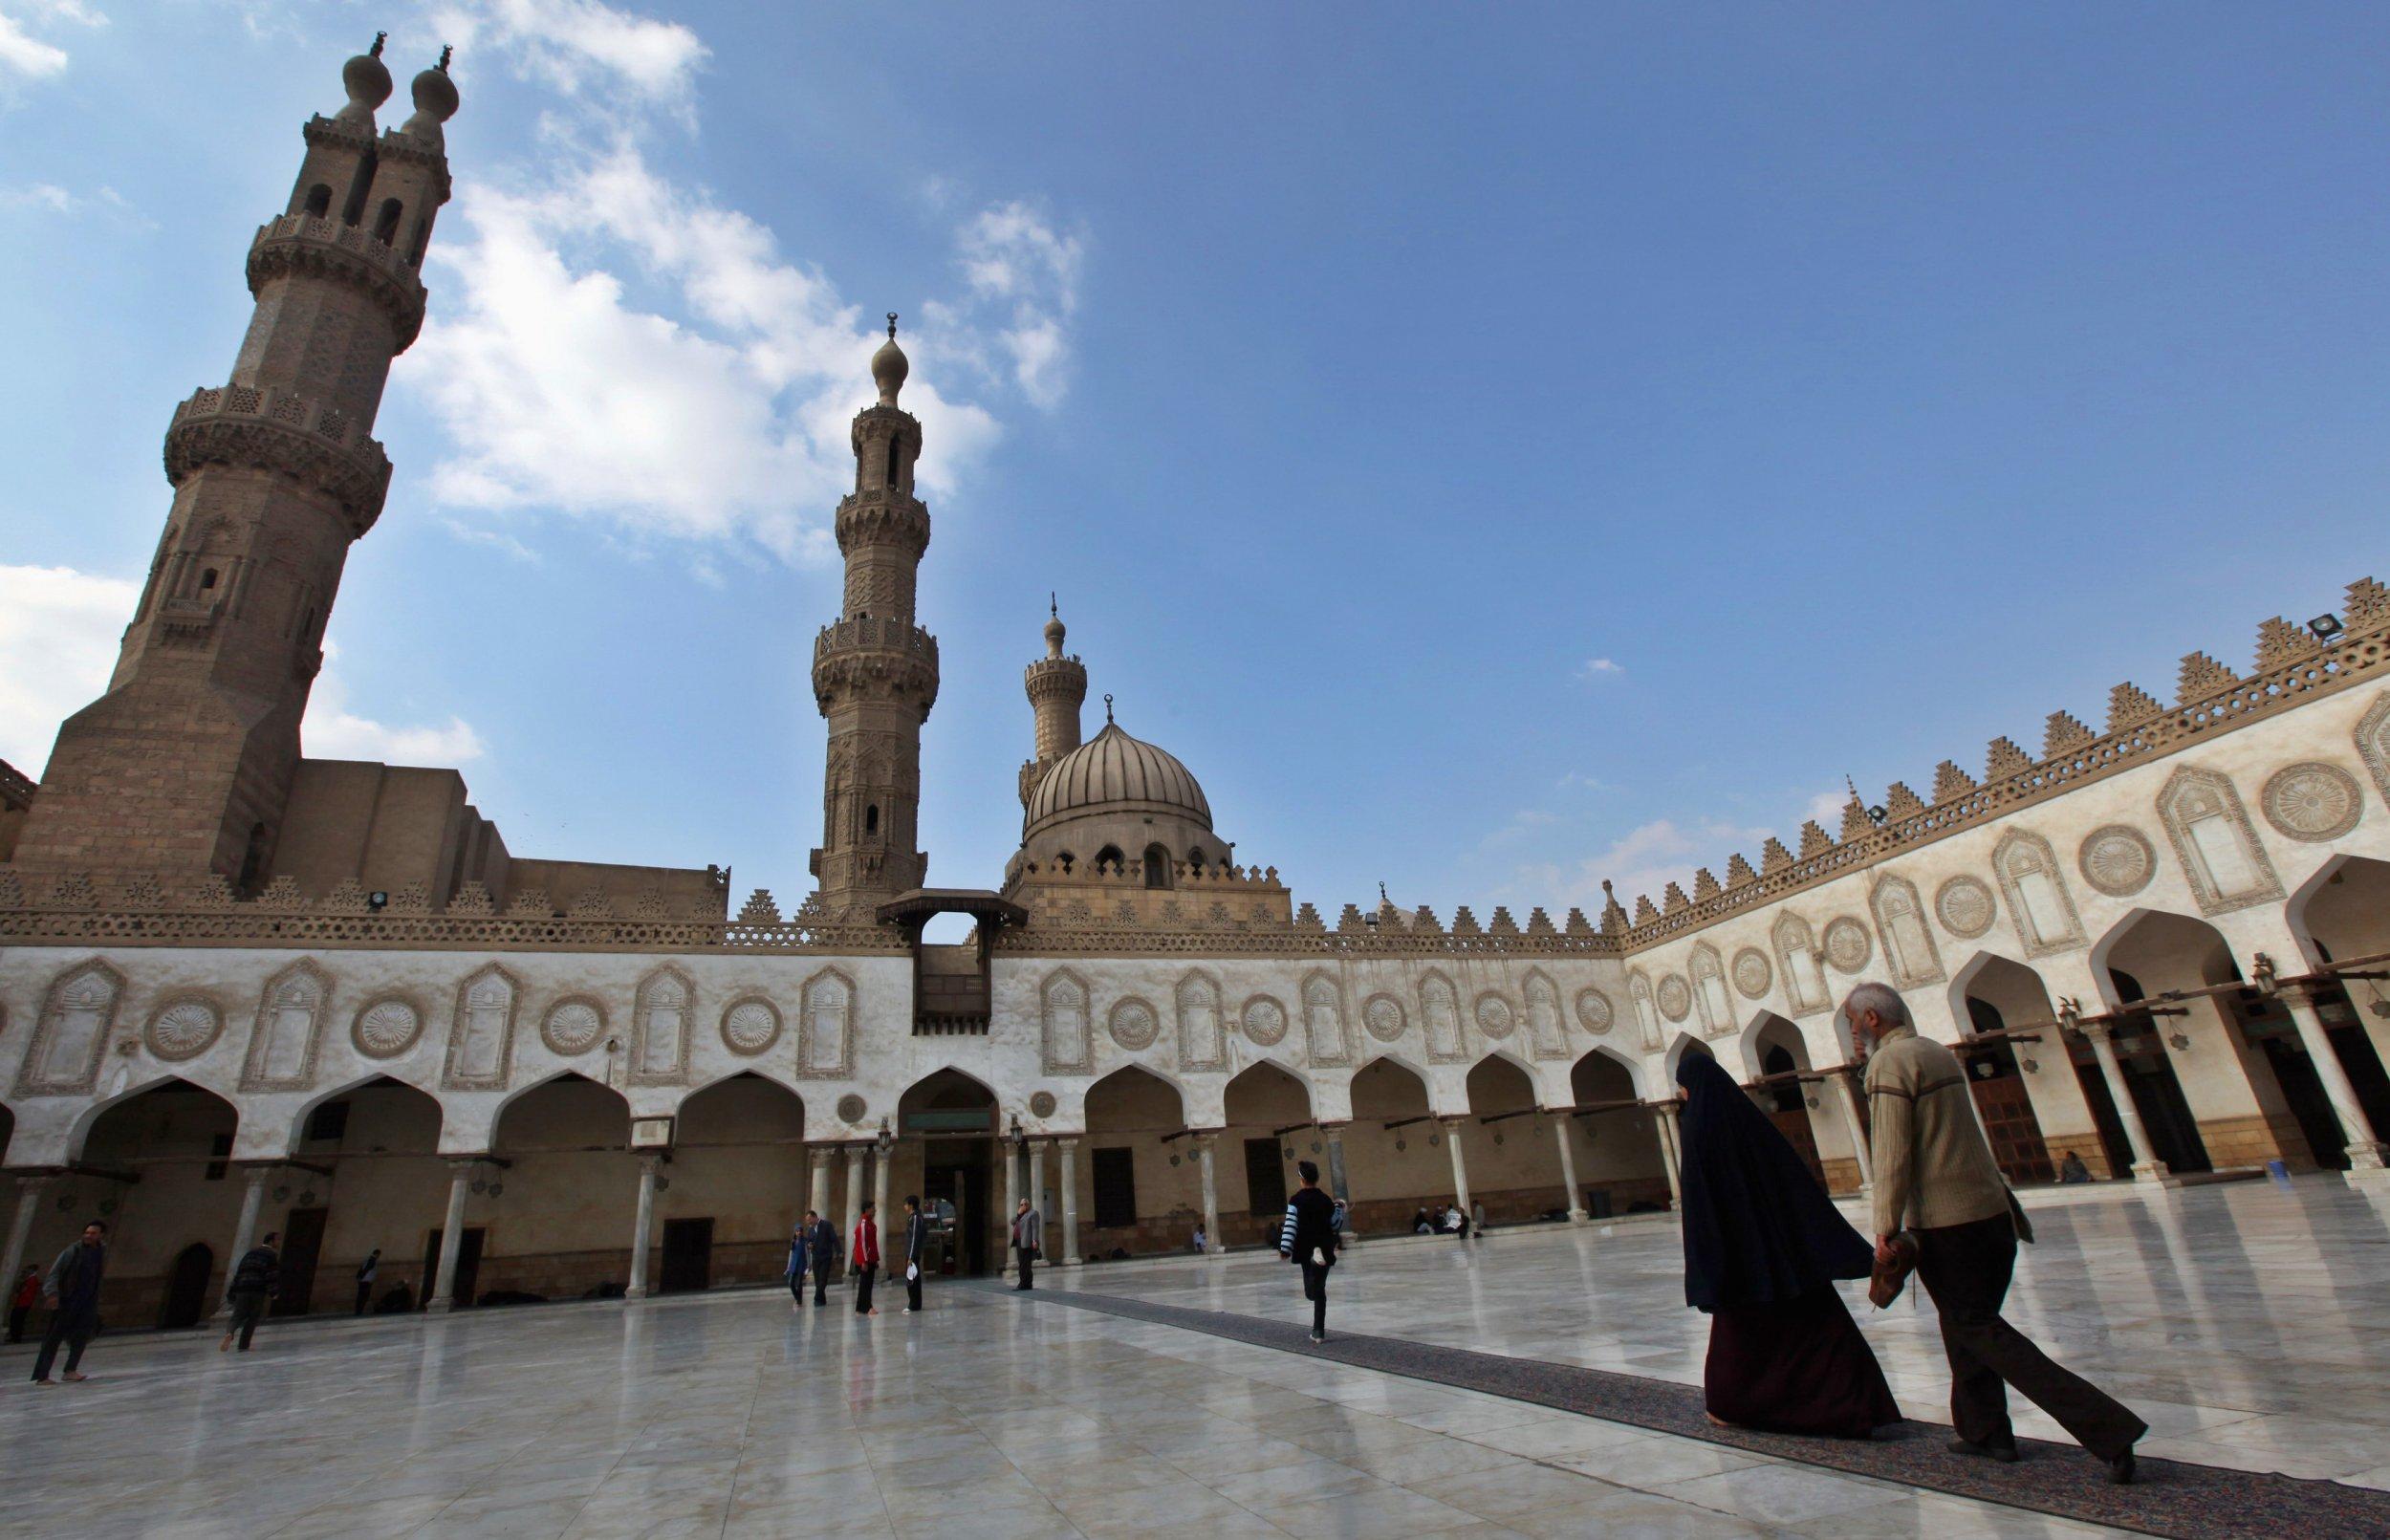 Picture of a Mosque cum madrassa